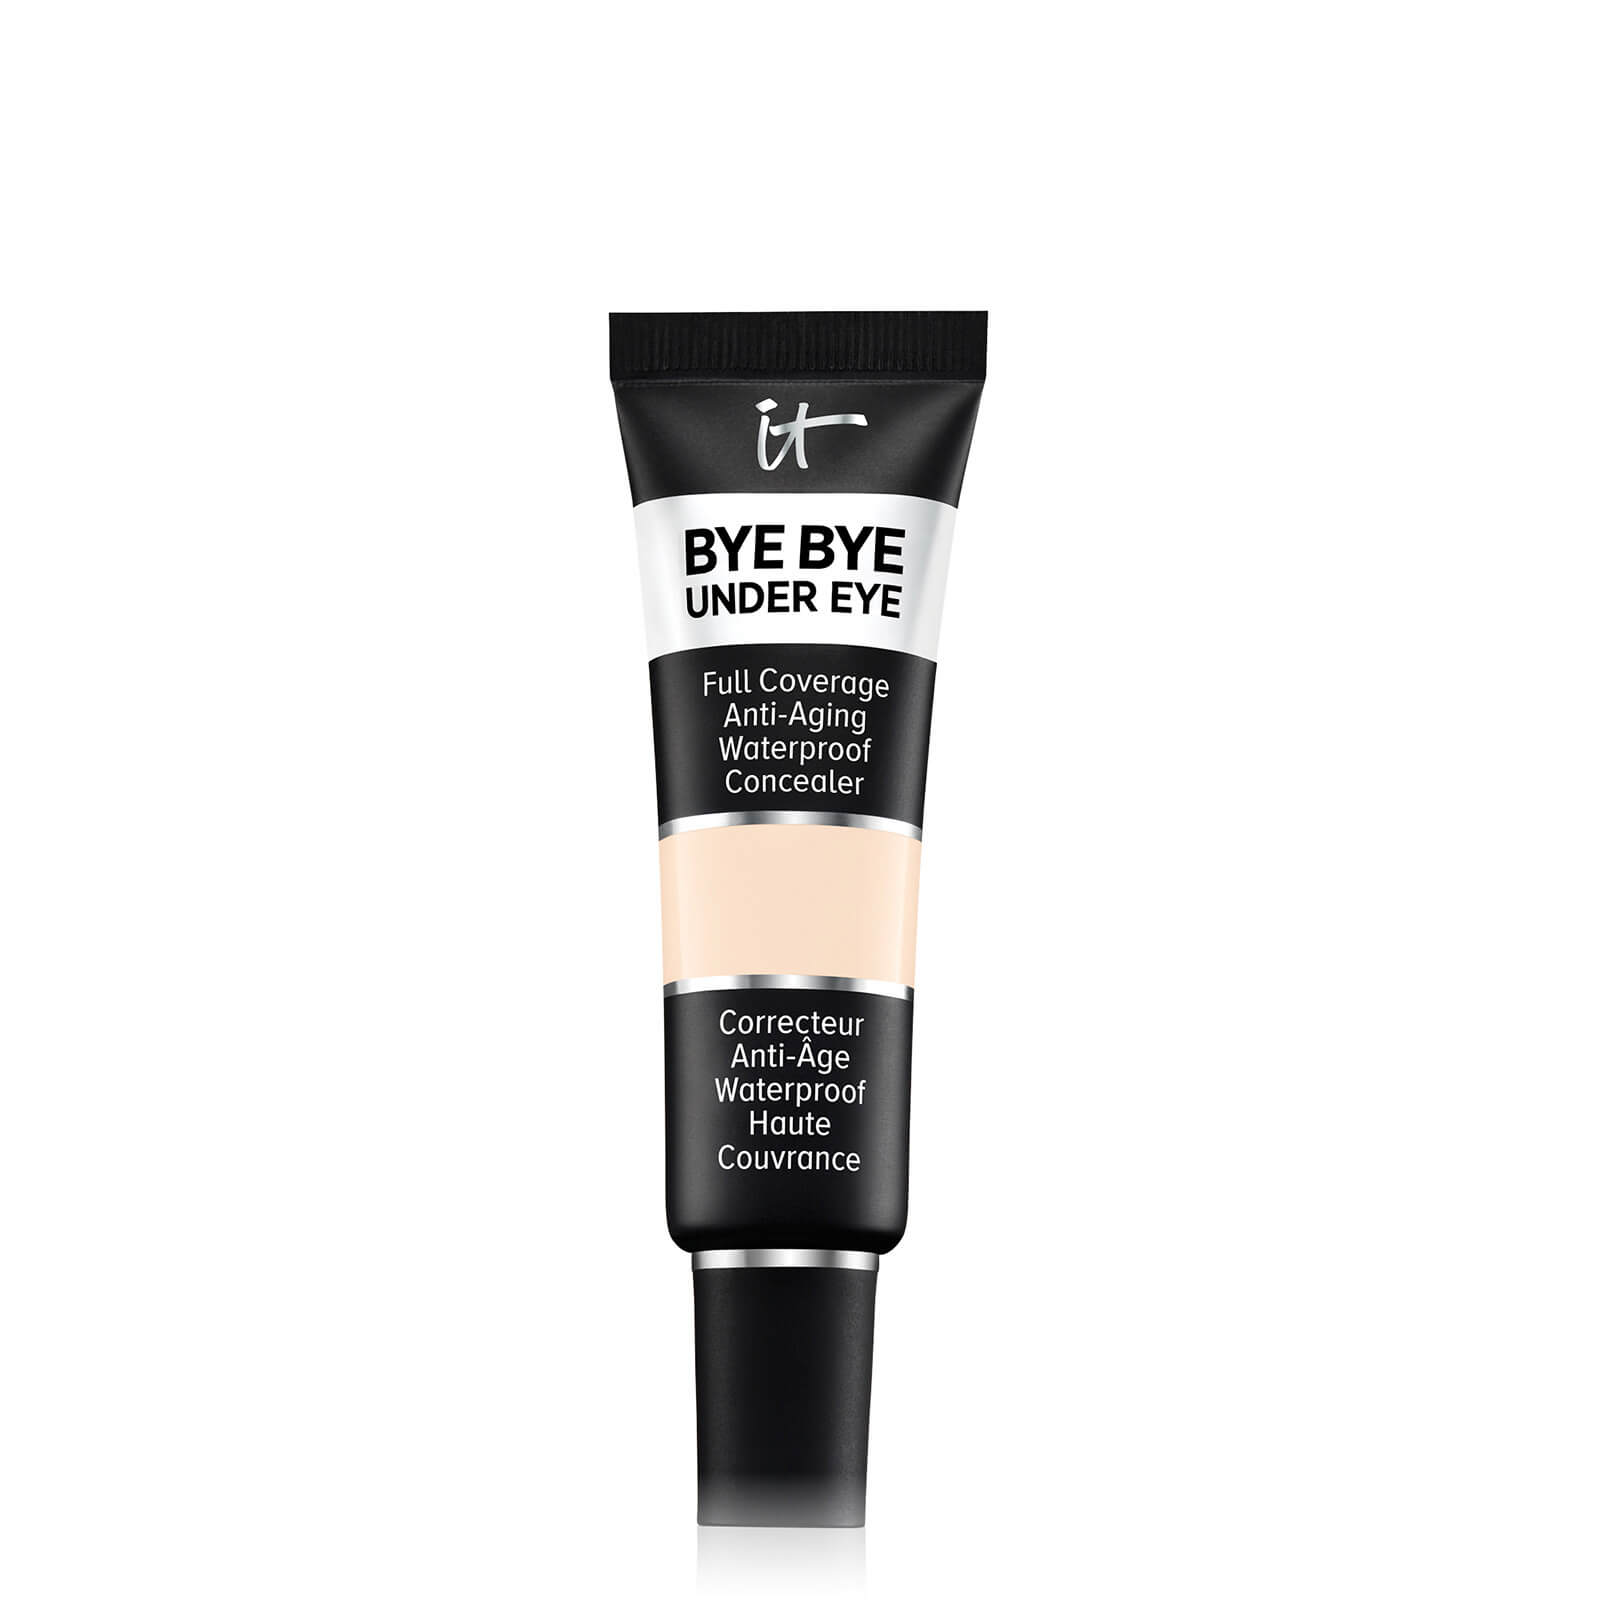 IT Cosmetics Bye Bye Under Eye Concealer 12ml (Various Shades) - Light